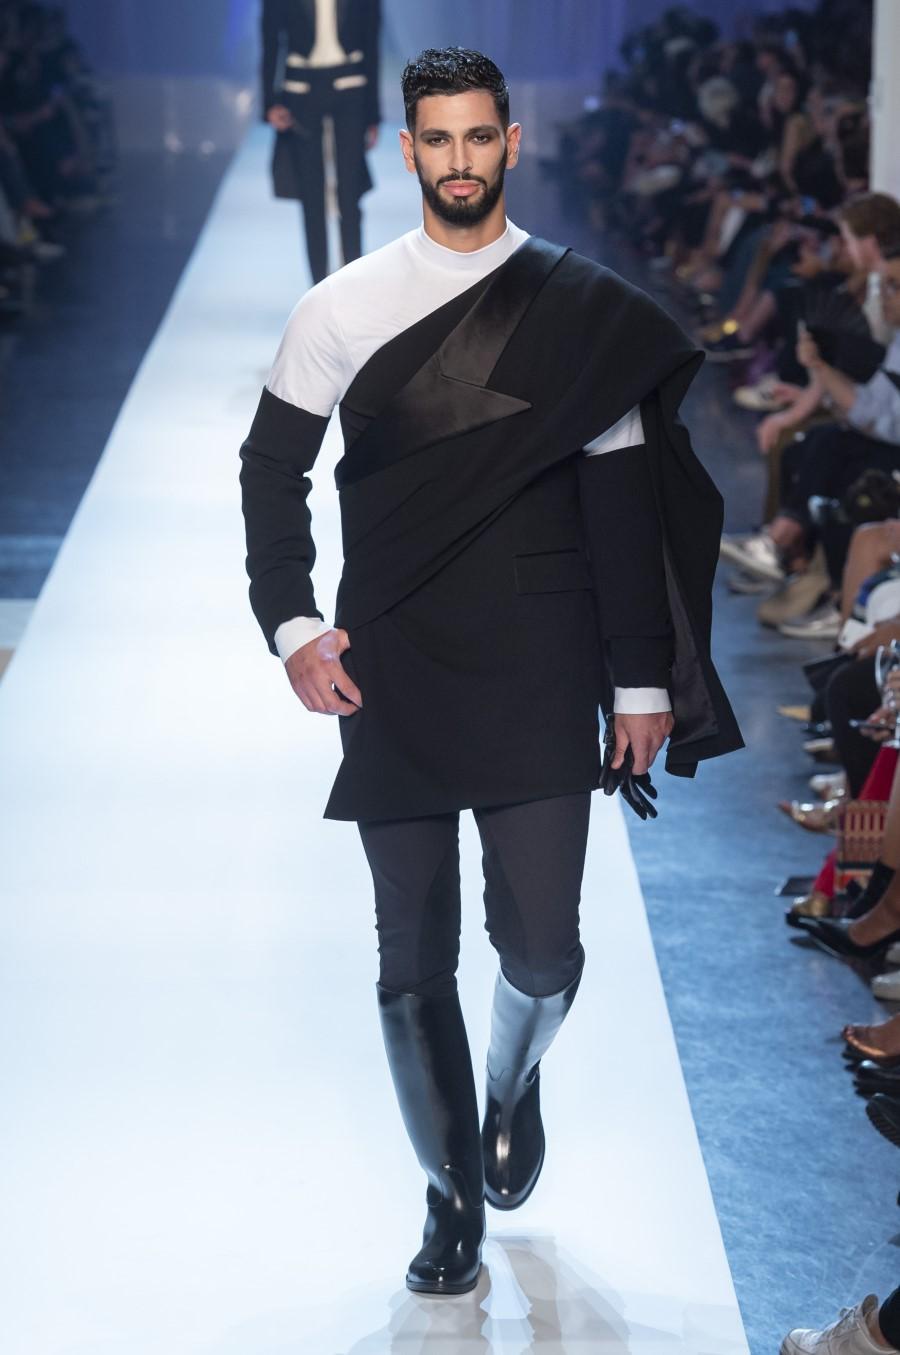 Jean Paul Gaultier Haute Couture Fall Winter 2018